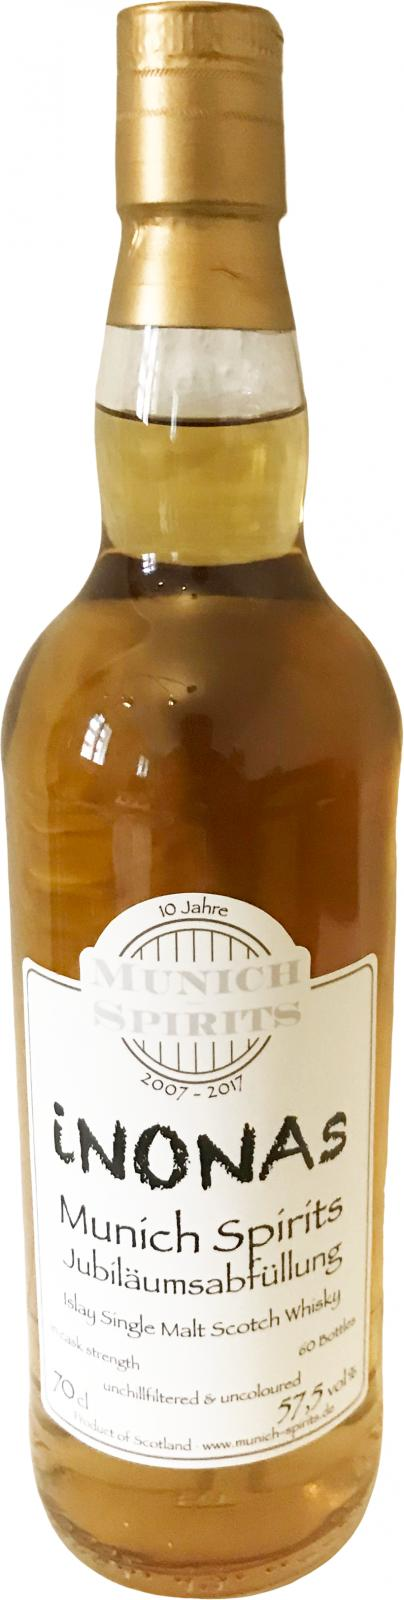 Islay Single Malt Scotch Whisky iNONAs